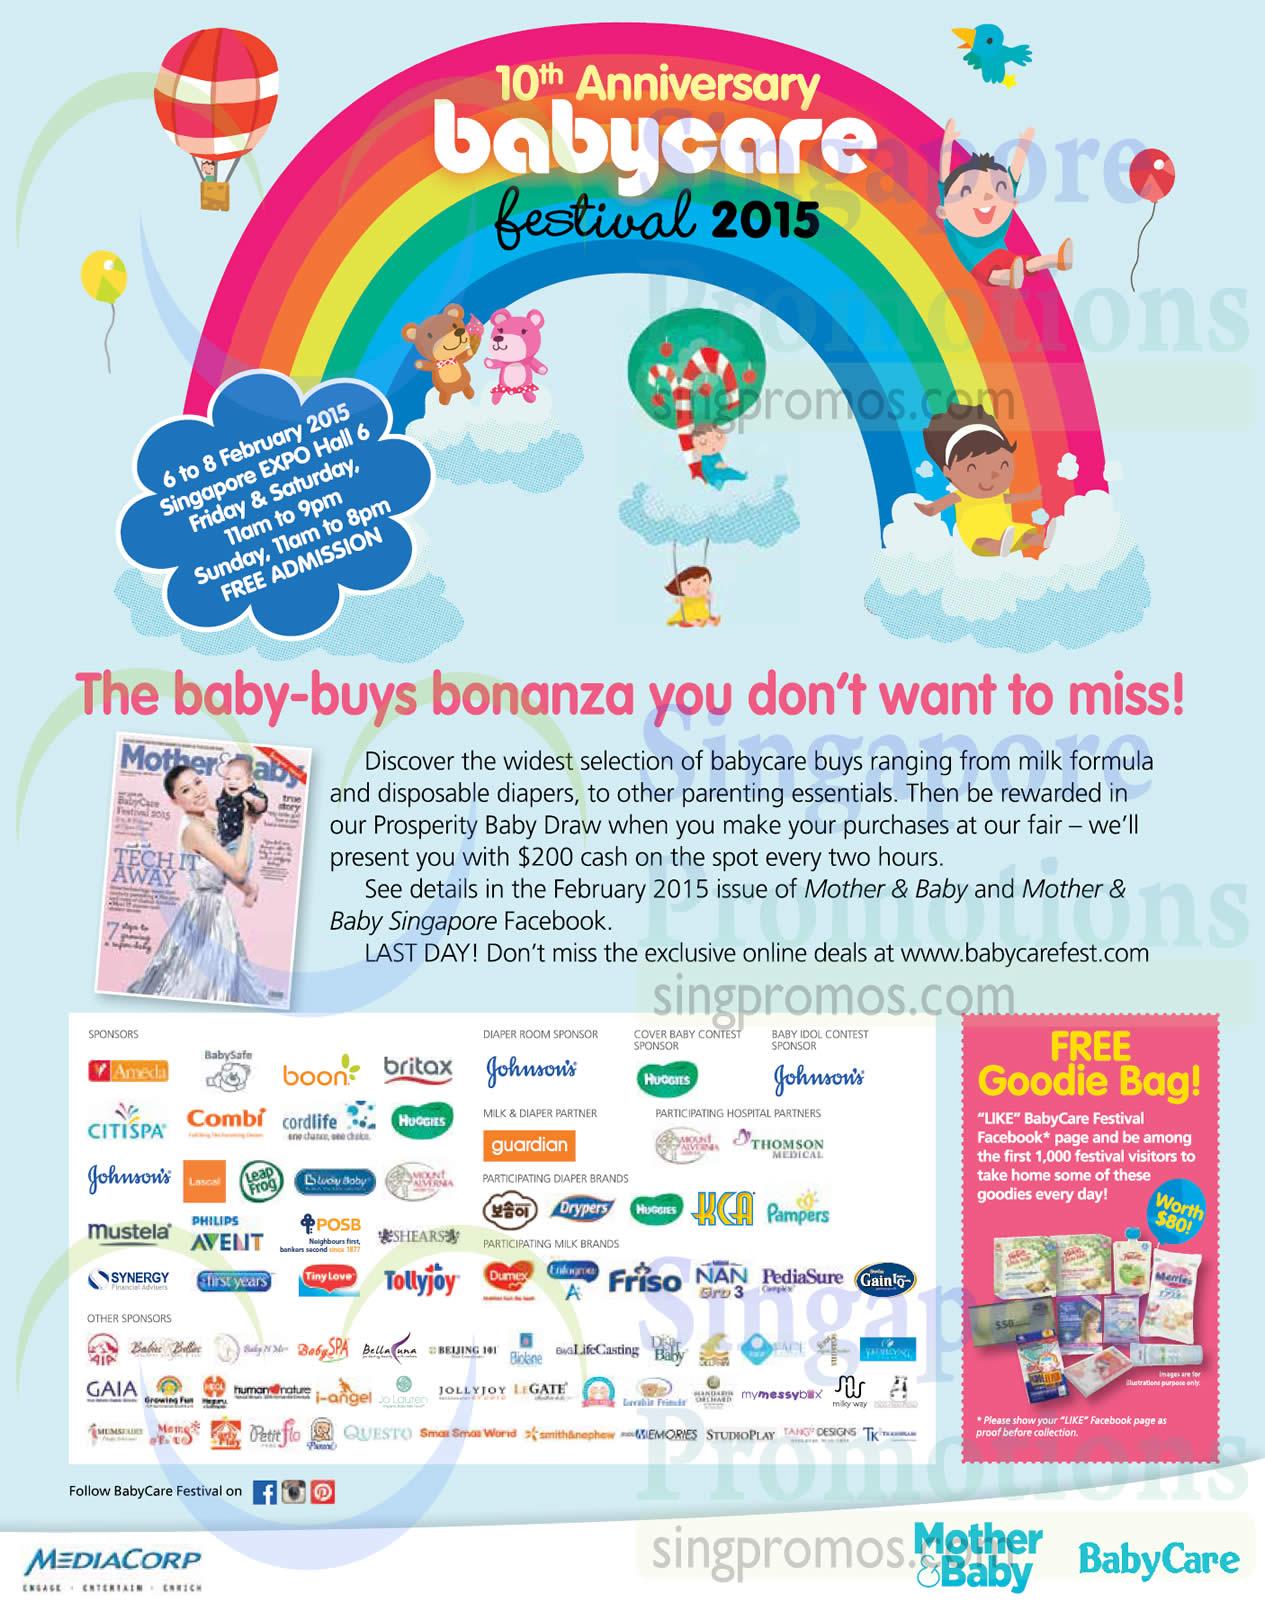 Babycare Festival Event Information